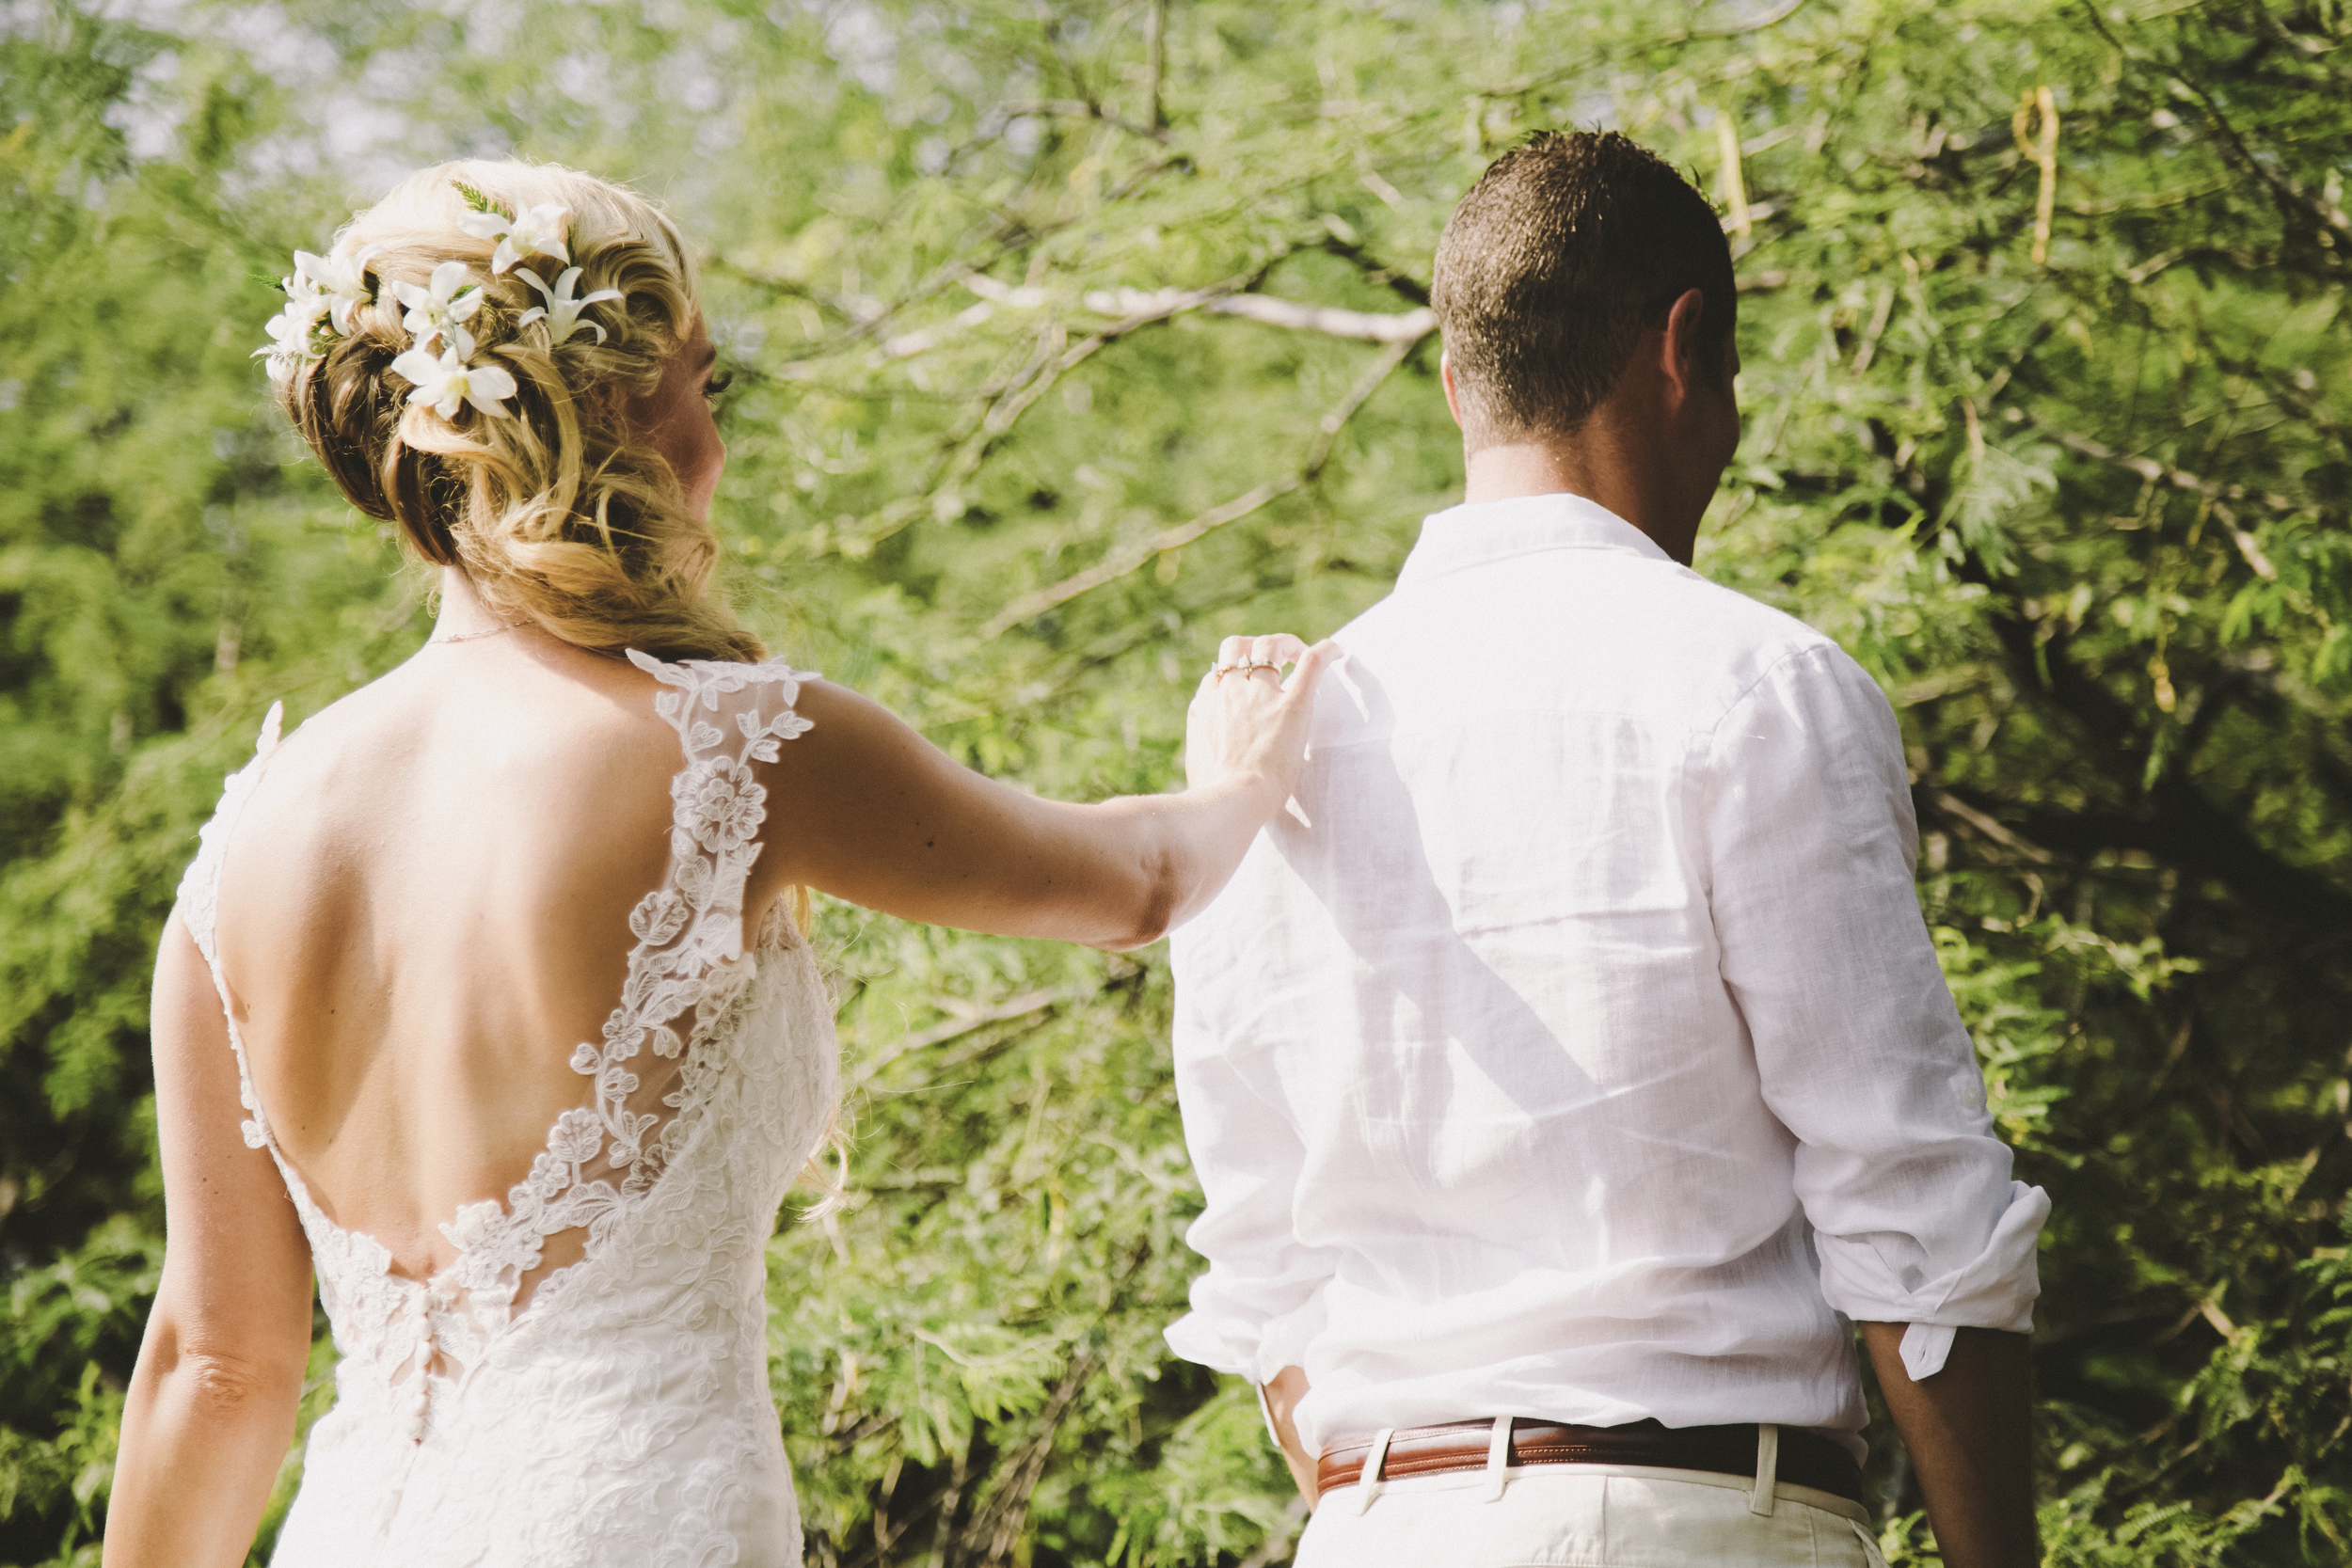 angie-diaz-photography-hawaii-wedding-photographer-kelli-jay-28.jpg